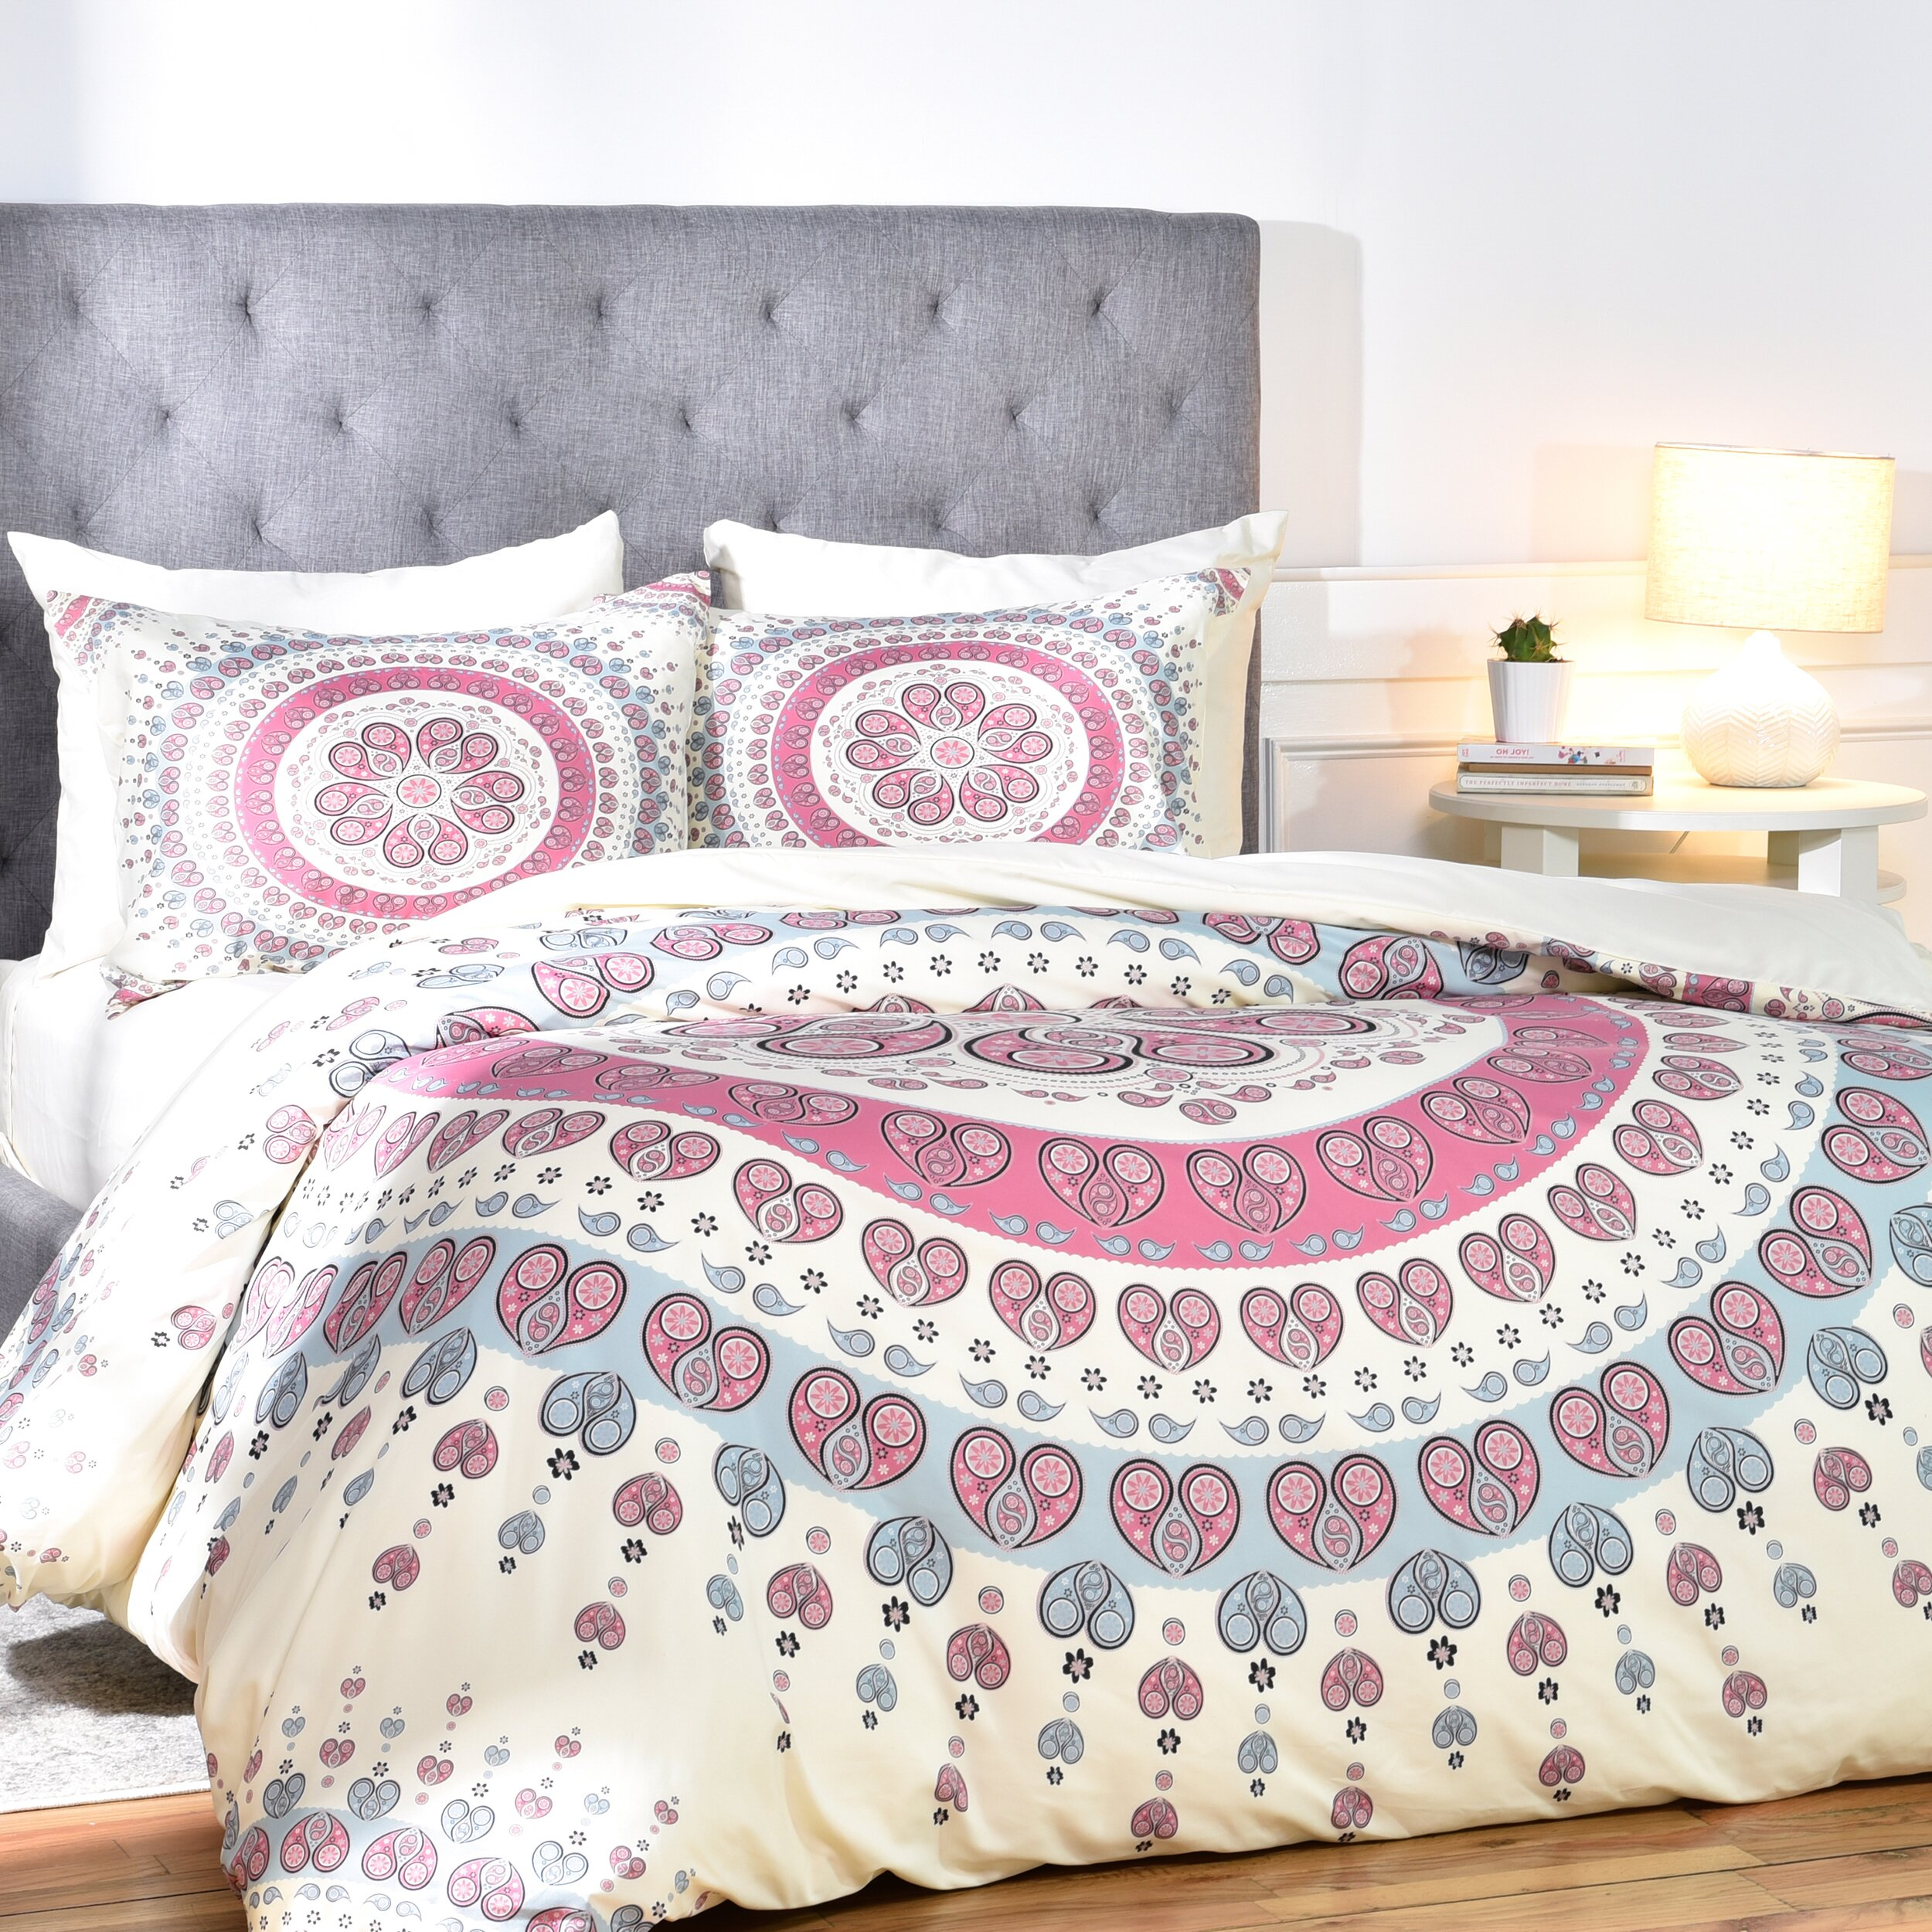 Bungalow Rose Navya Wood Storage Bedroom Bench Reviews: Bungalow Rose Silkeborg Duvet Cover Set